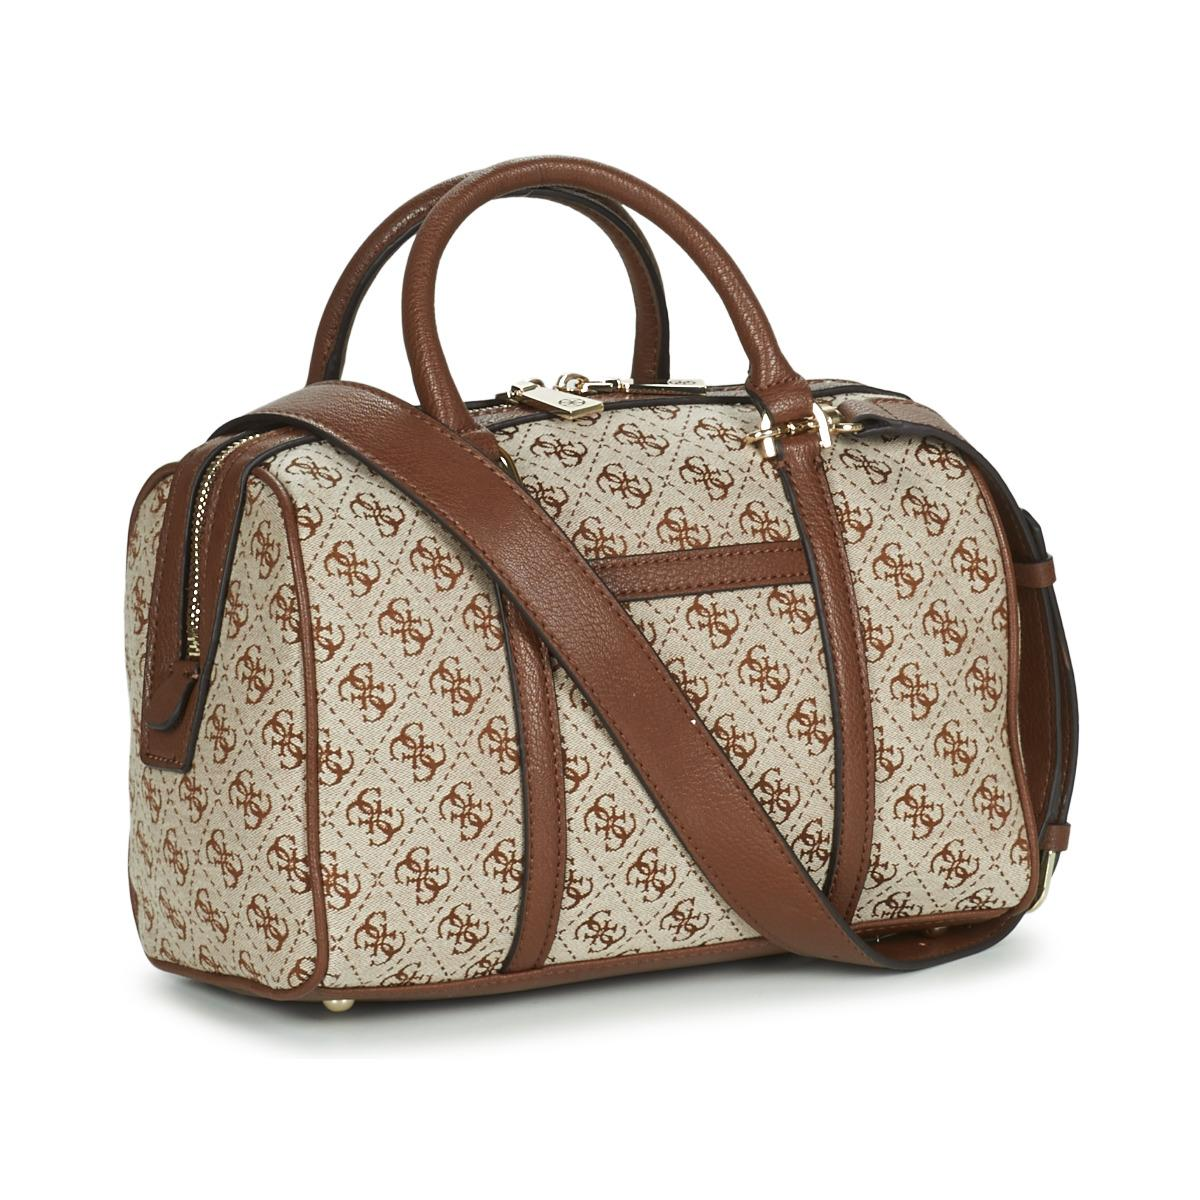 56760c06b6357 Guess - Vintage Box Satchel Women s Handbags In Brown for Men - Lyst. View  fullscreen